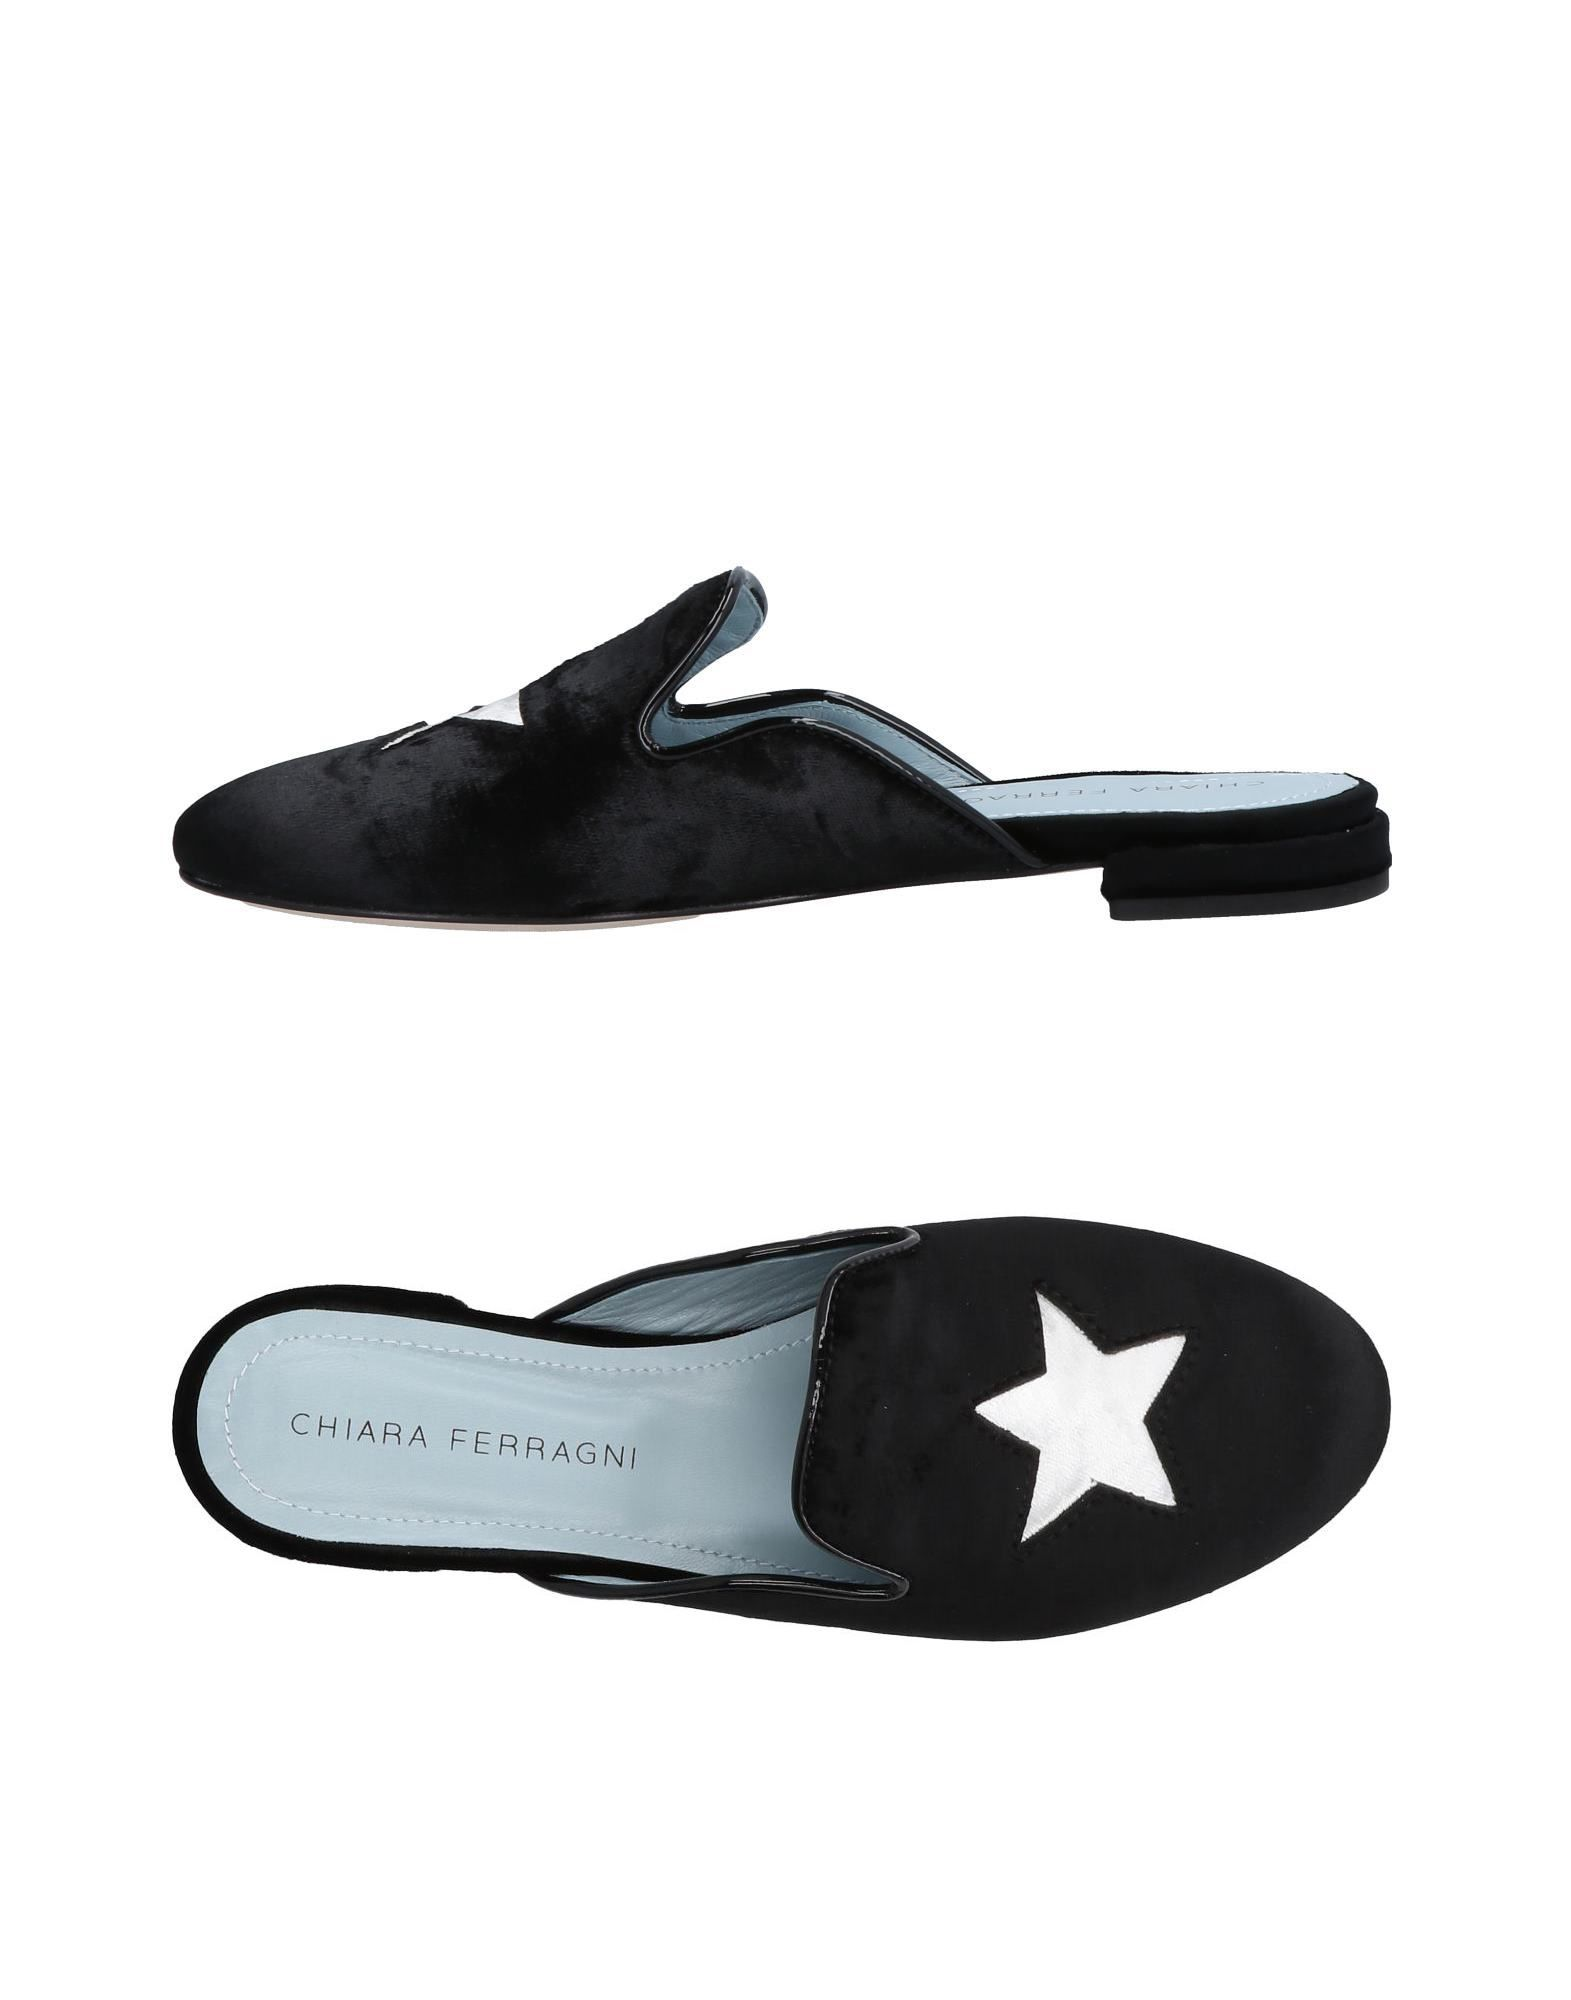 Stilvolle billige Schuhe Chiara Ferragni Pantoletten Damen  11494629QL